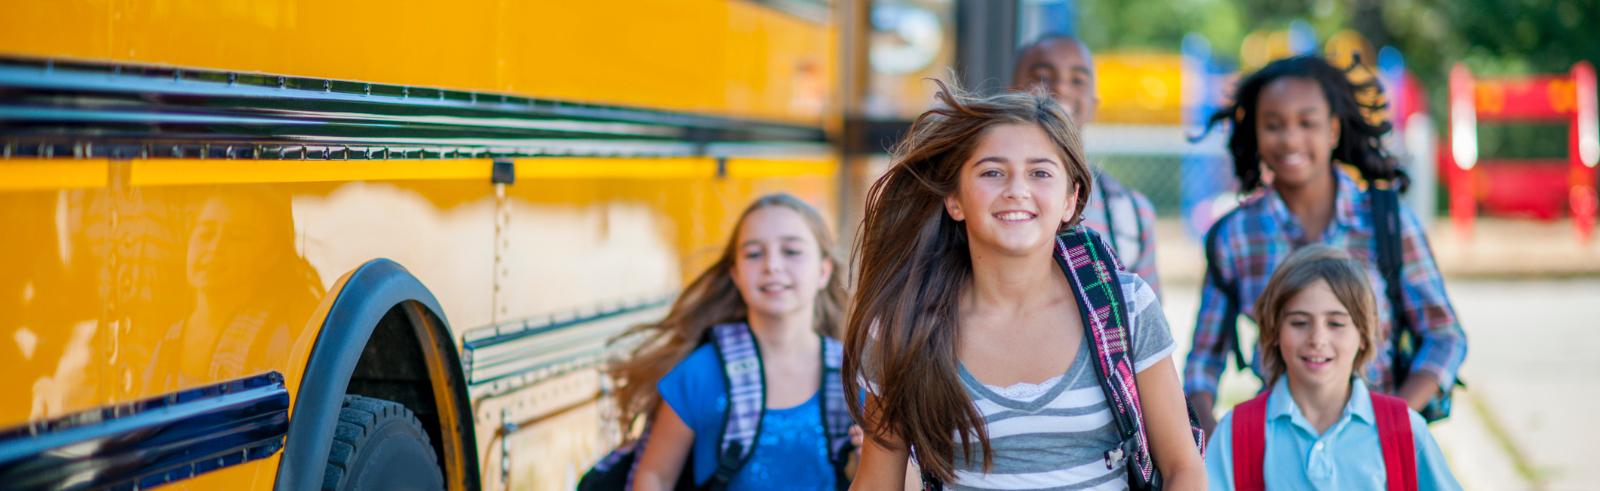 Students beside school bus